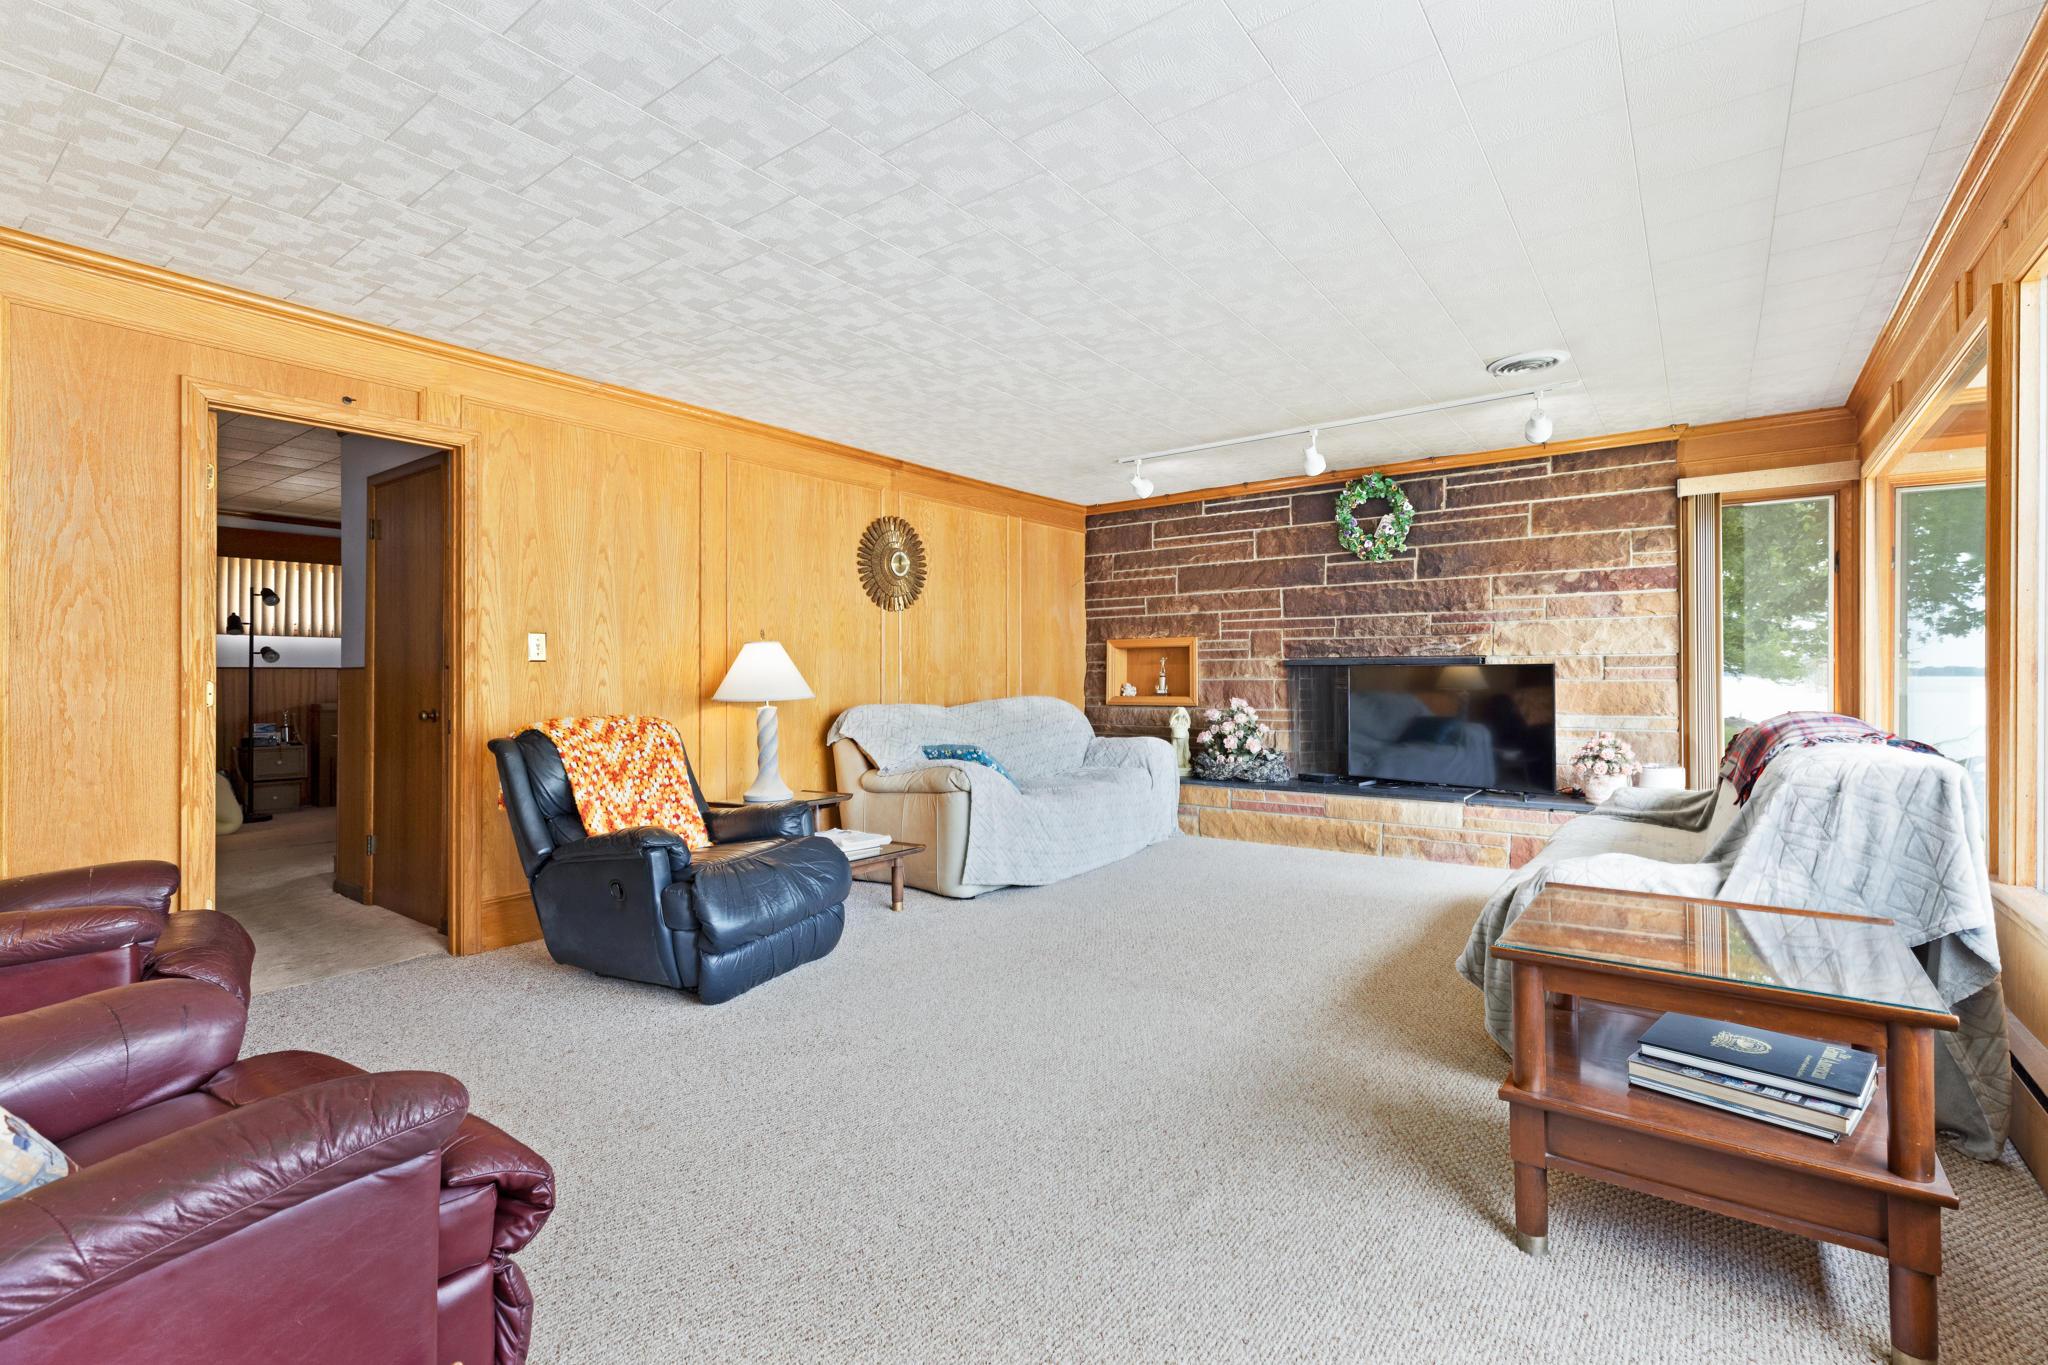 134 Brads Way Property Photo 12